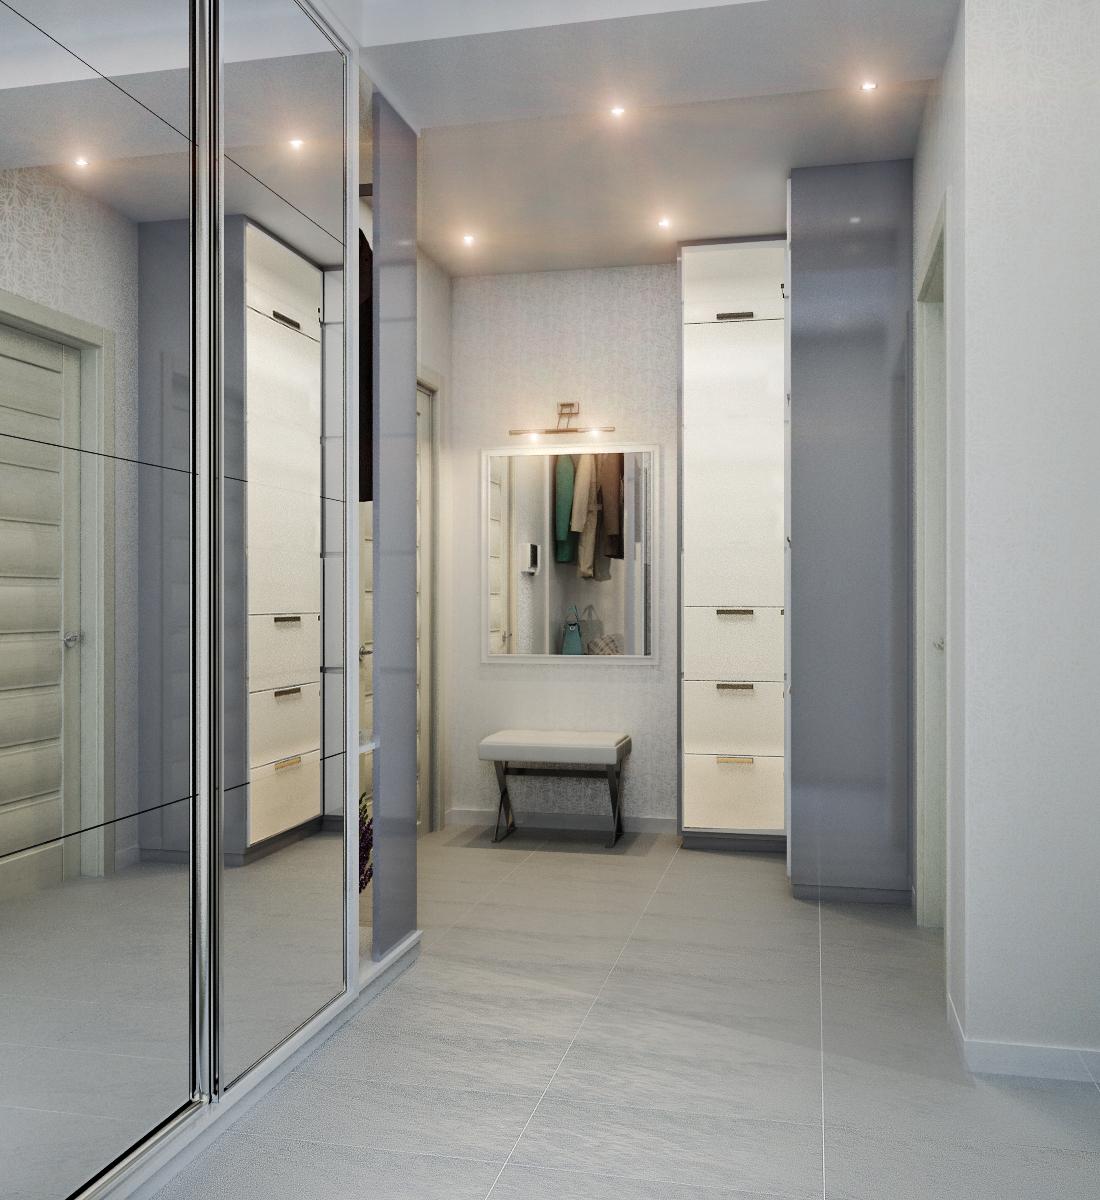 Зеркала напротив друг друга в коридоре